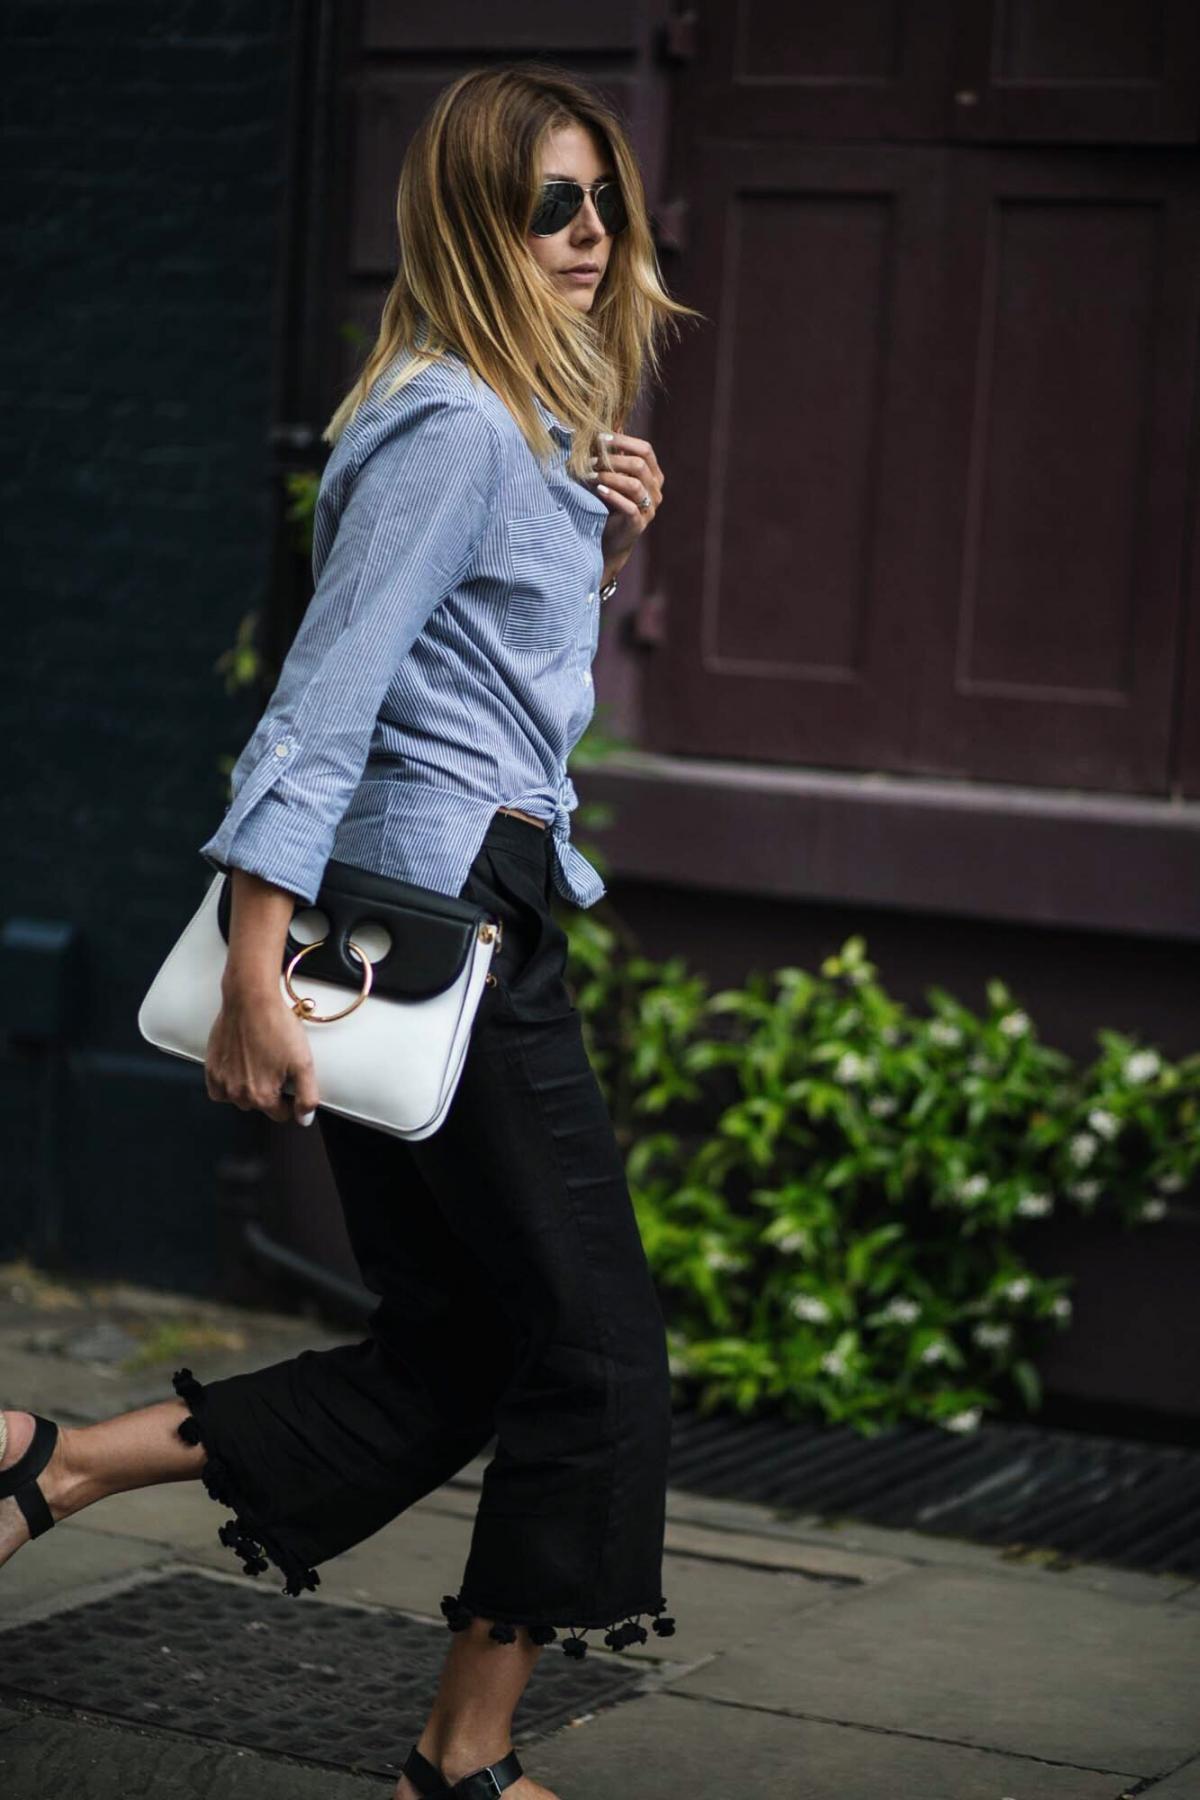 Blue pinstripe shirt, JW Anderson Pierce bag in monochrome, black trousers, street style